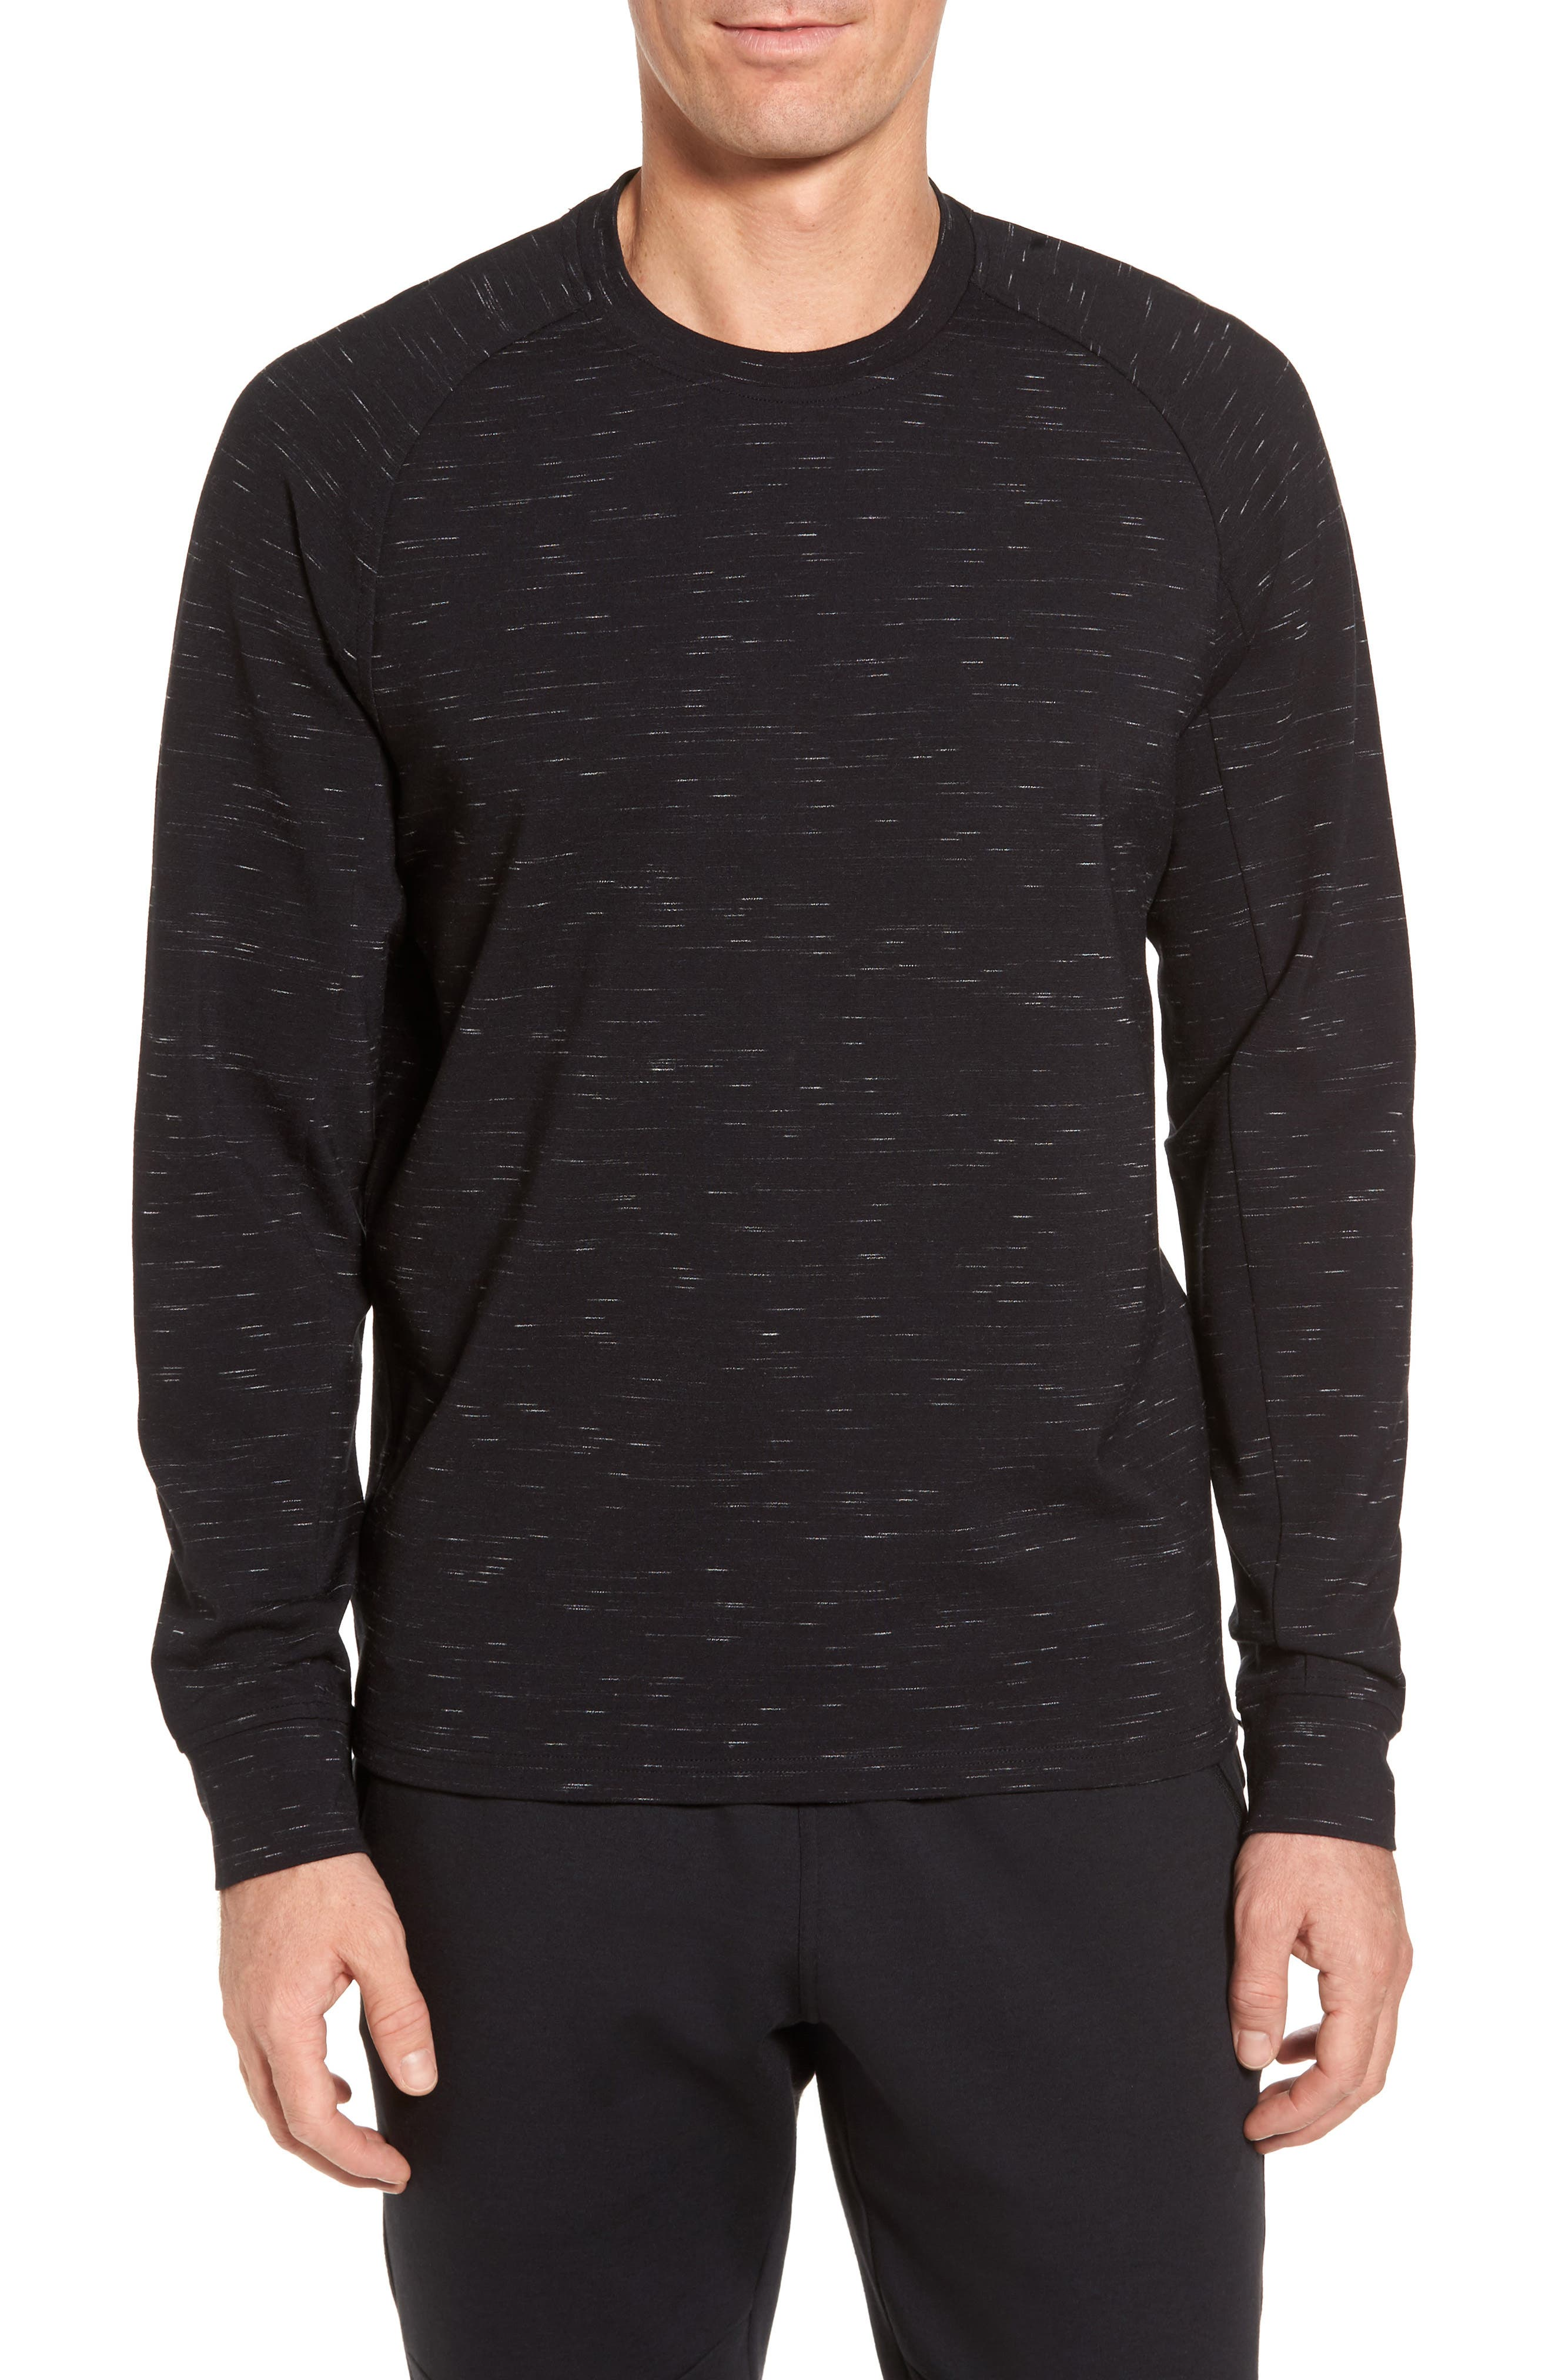 Main Image - Smartwool Merino 250 Base Layer Pattern Crewneck T-Shirt